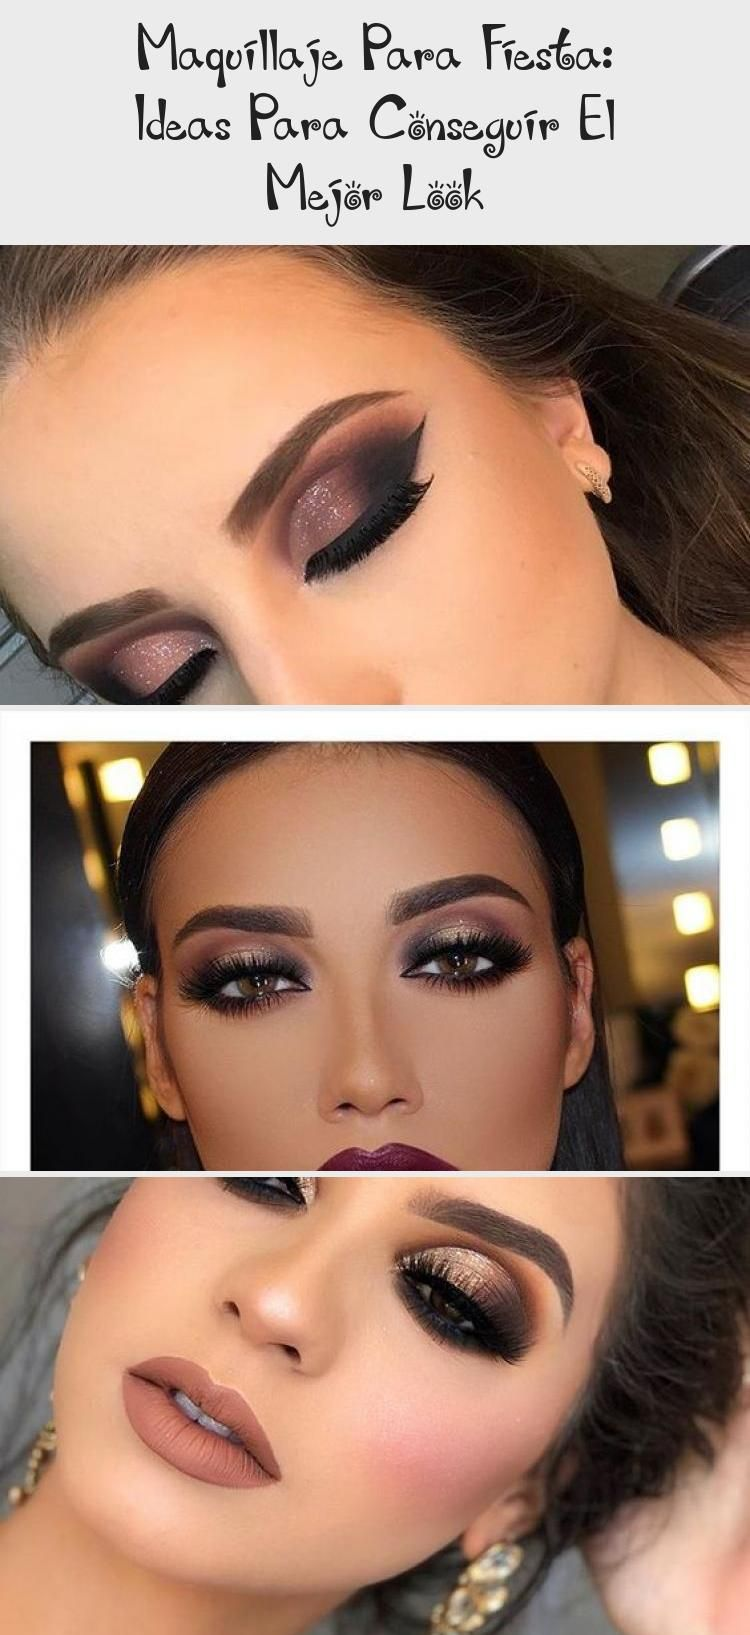 Maquillaje Para Fiesta De Dia Maquillaje Para Fiesta De Noche Paso A Paso Maquillaje Para Fiesta De Dia Maquill In 2020 Best Makeup Products Party Makeup Makeup Ide